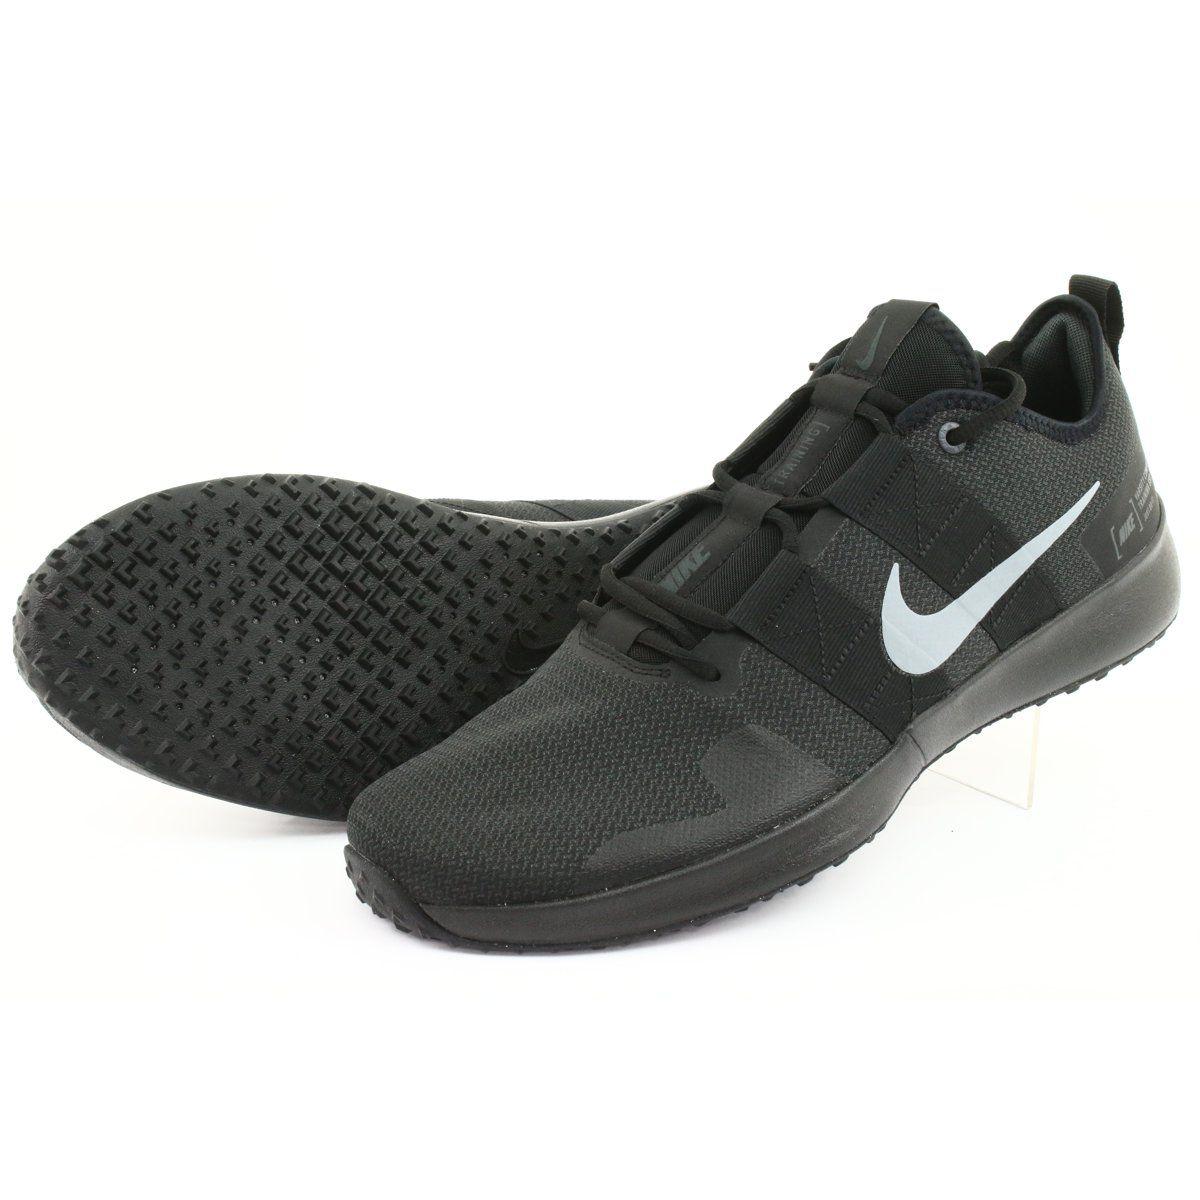 Buty Treningowe Nike Varsity Compete Tr2 M At1239 001 Czarne Mens Nike Shoes Nike Training Shoes